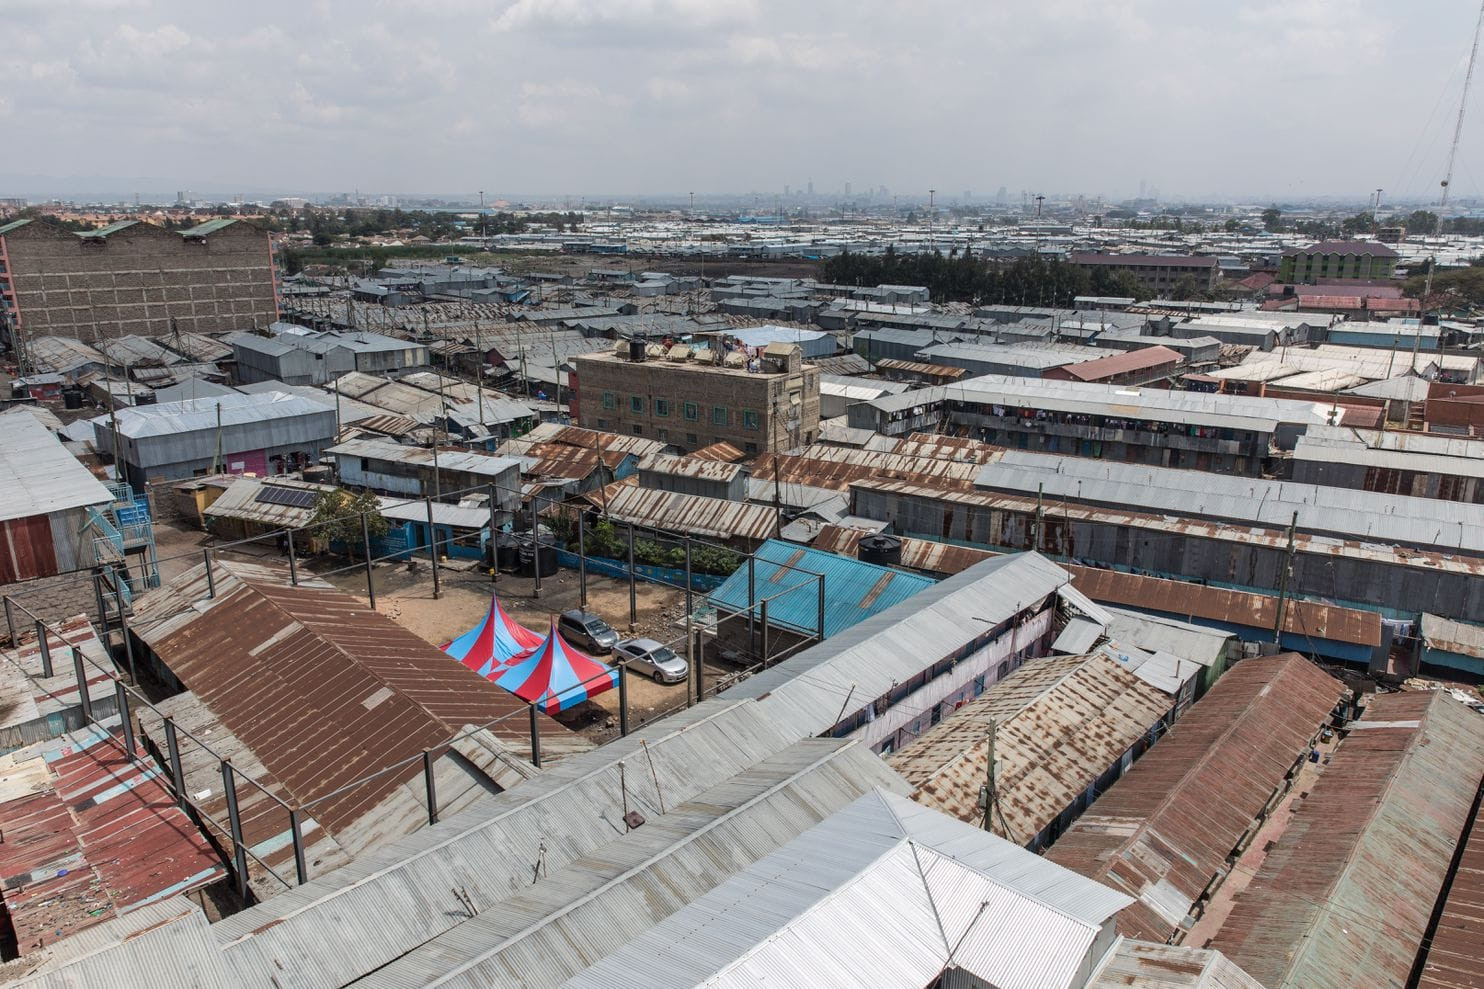 An aerial view of Mukuru kwa Njenga, where Sarah lives and goes to school. (Sarah Waiswa for The Washington Post)